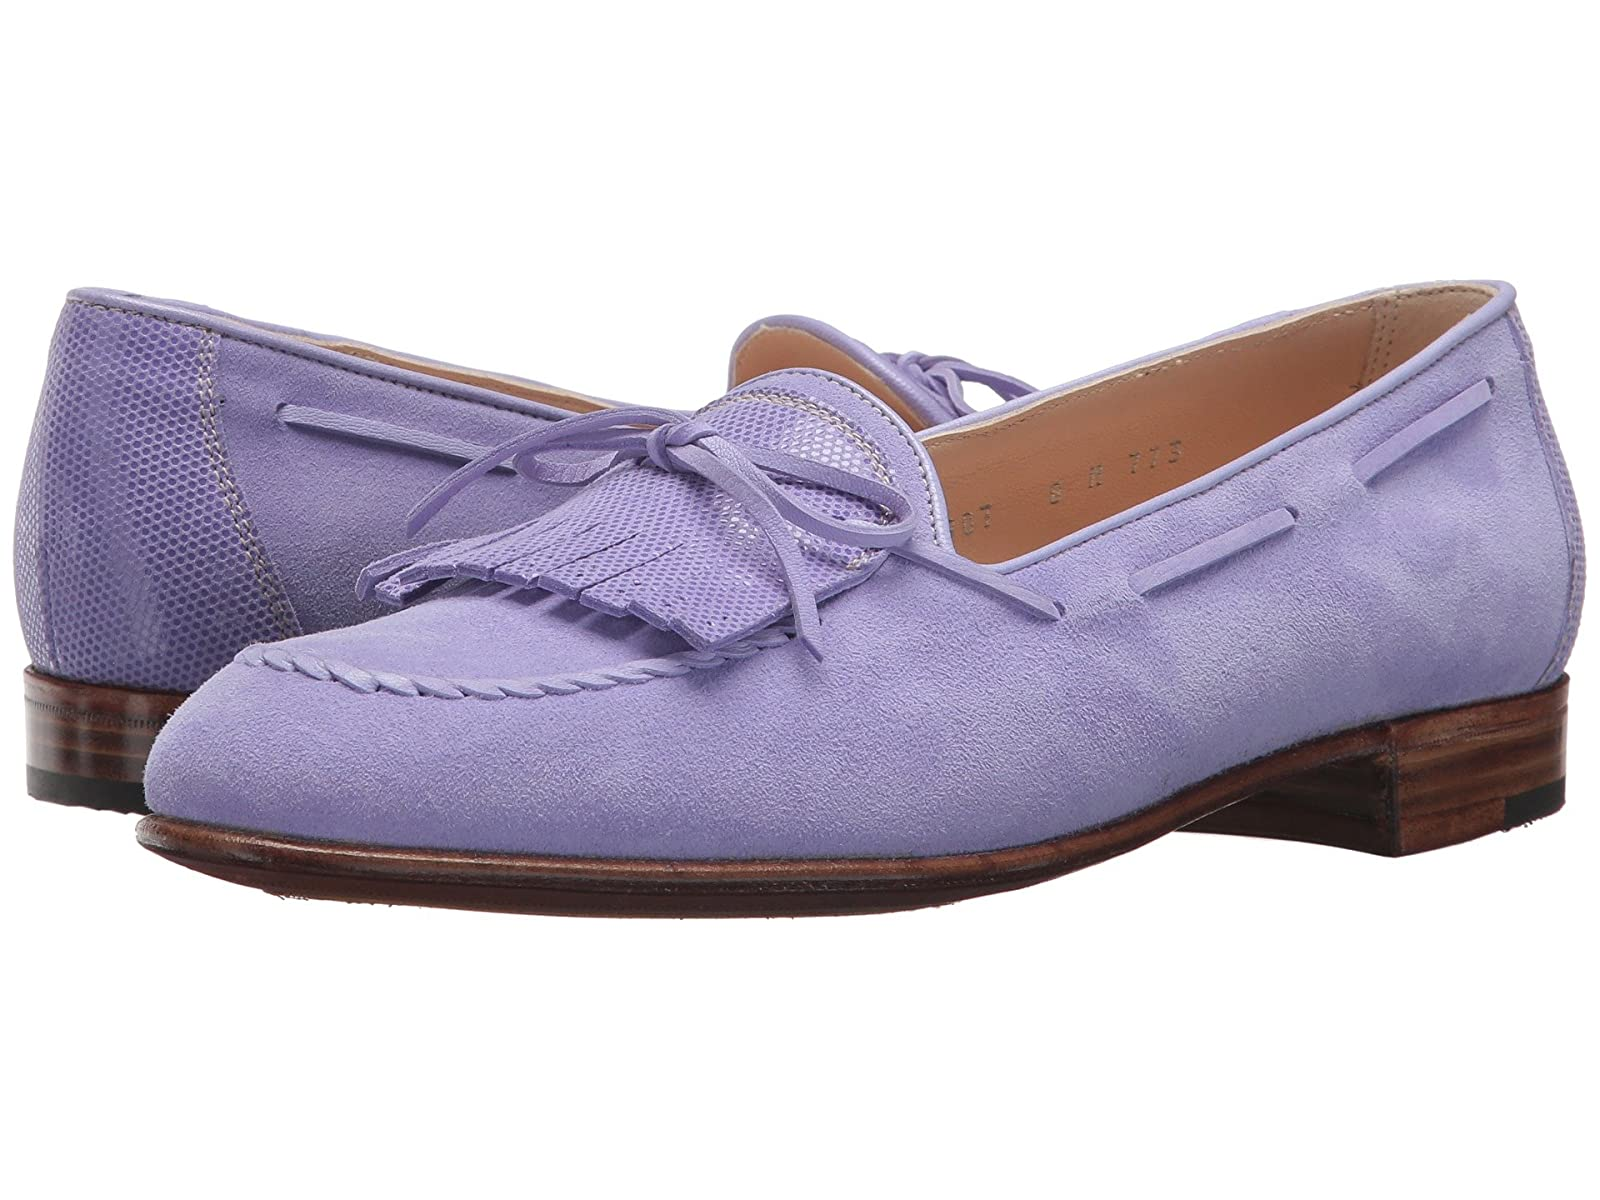 Gravati Kiltie LoaferAtmospheric grades have affordable shoes